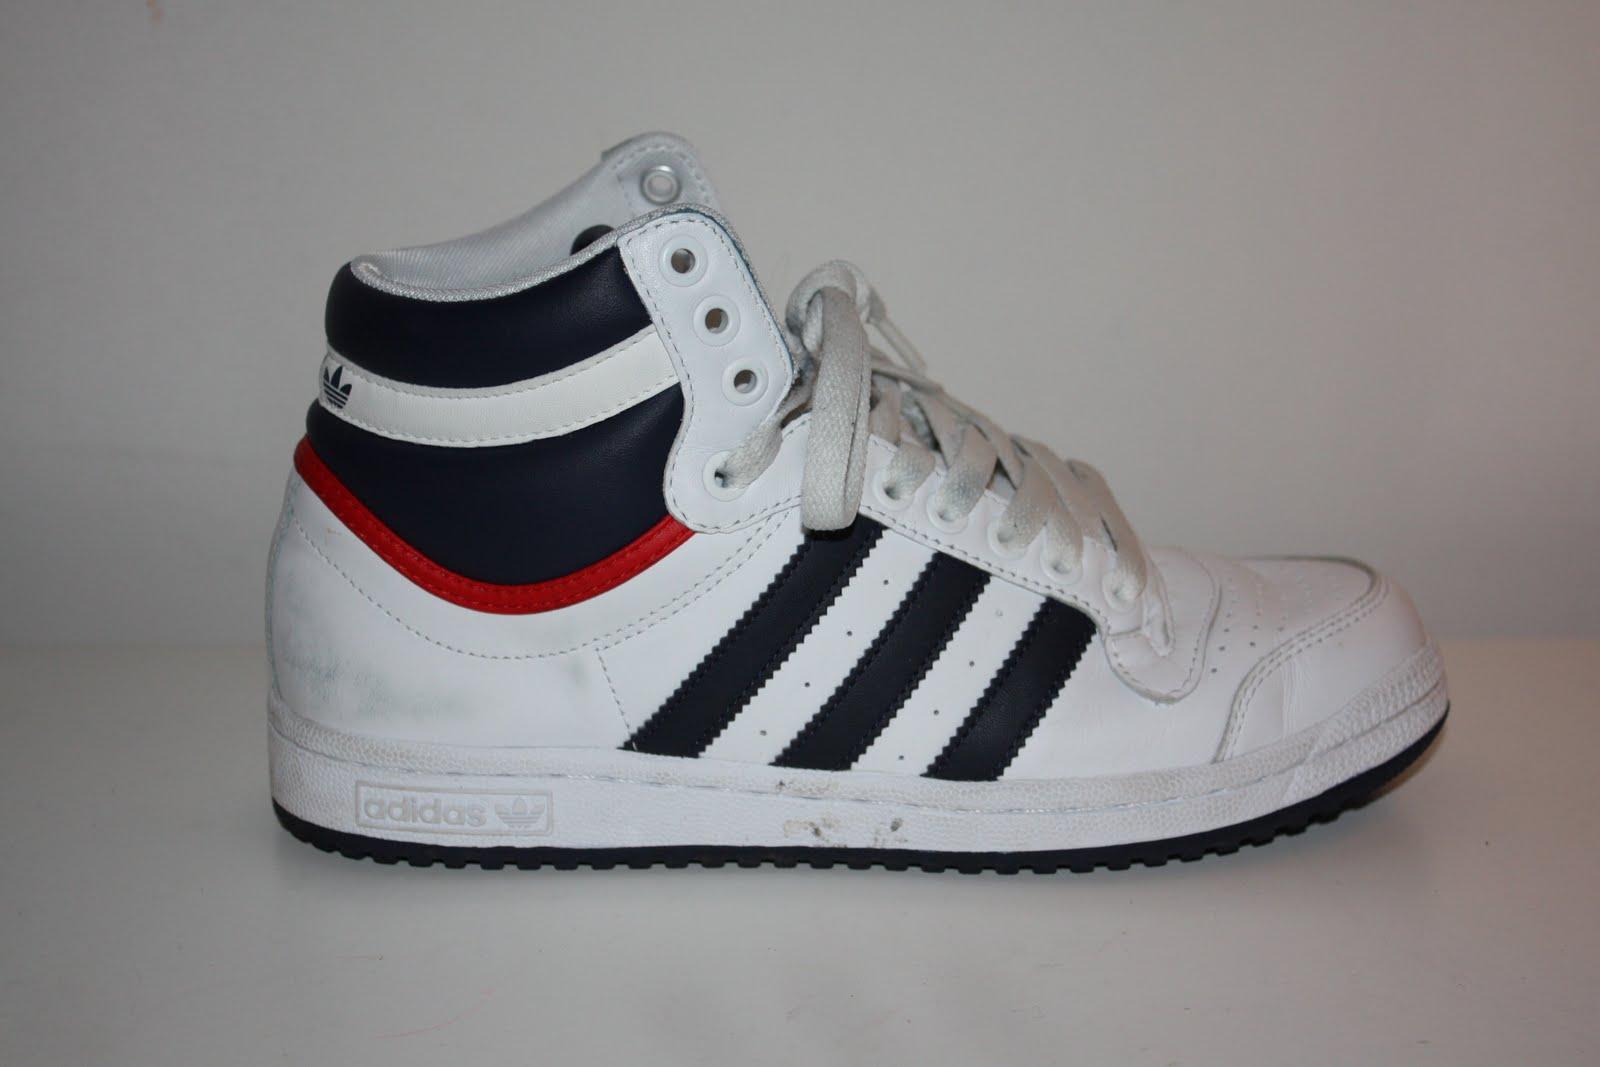 Top Tens Sneakers 28 Images Adidas Top Ten Hi Shoes